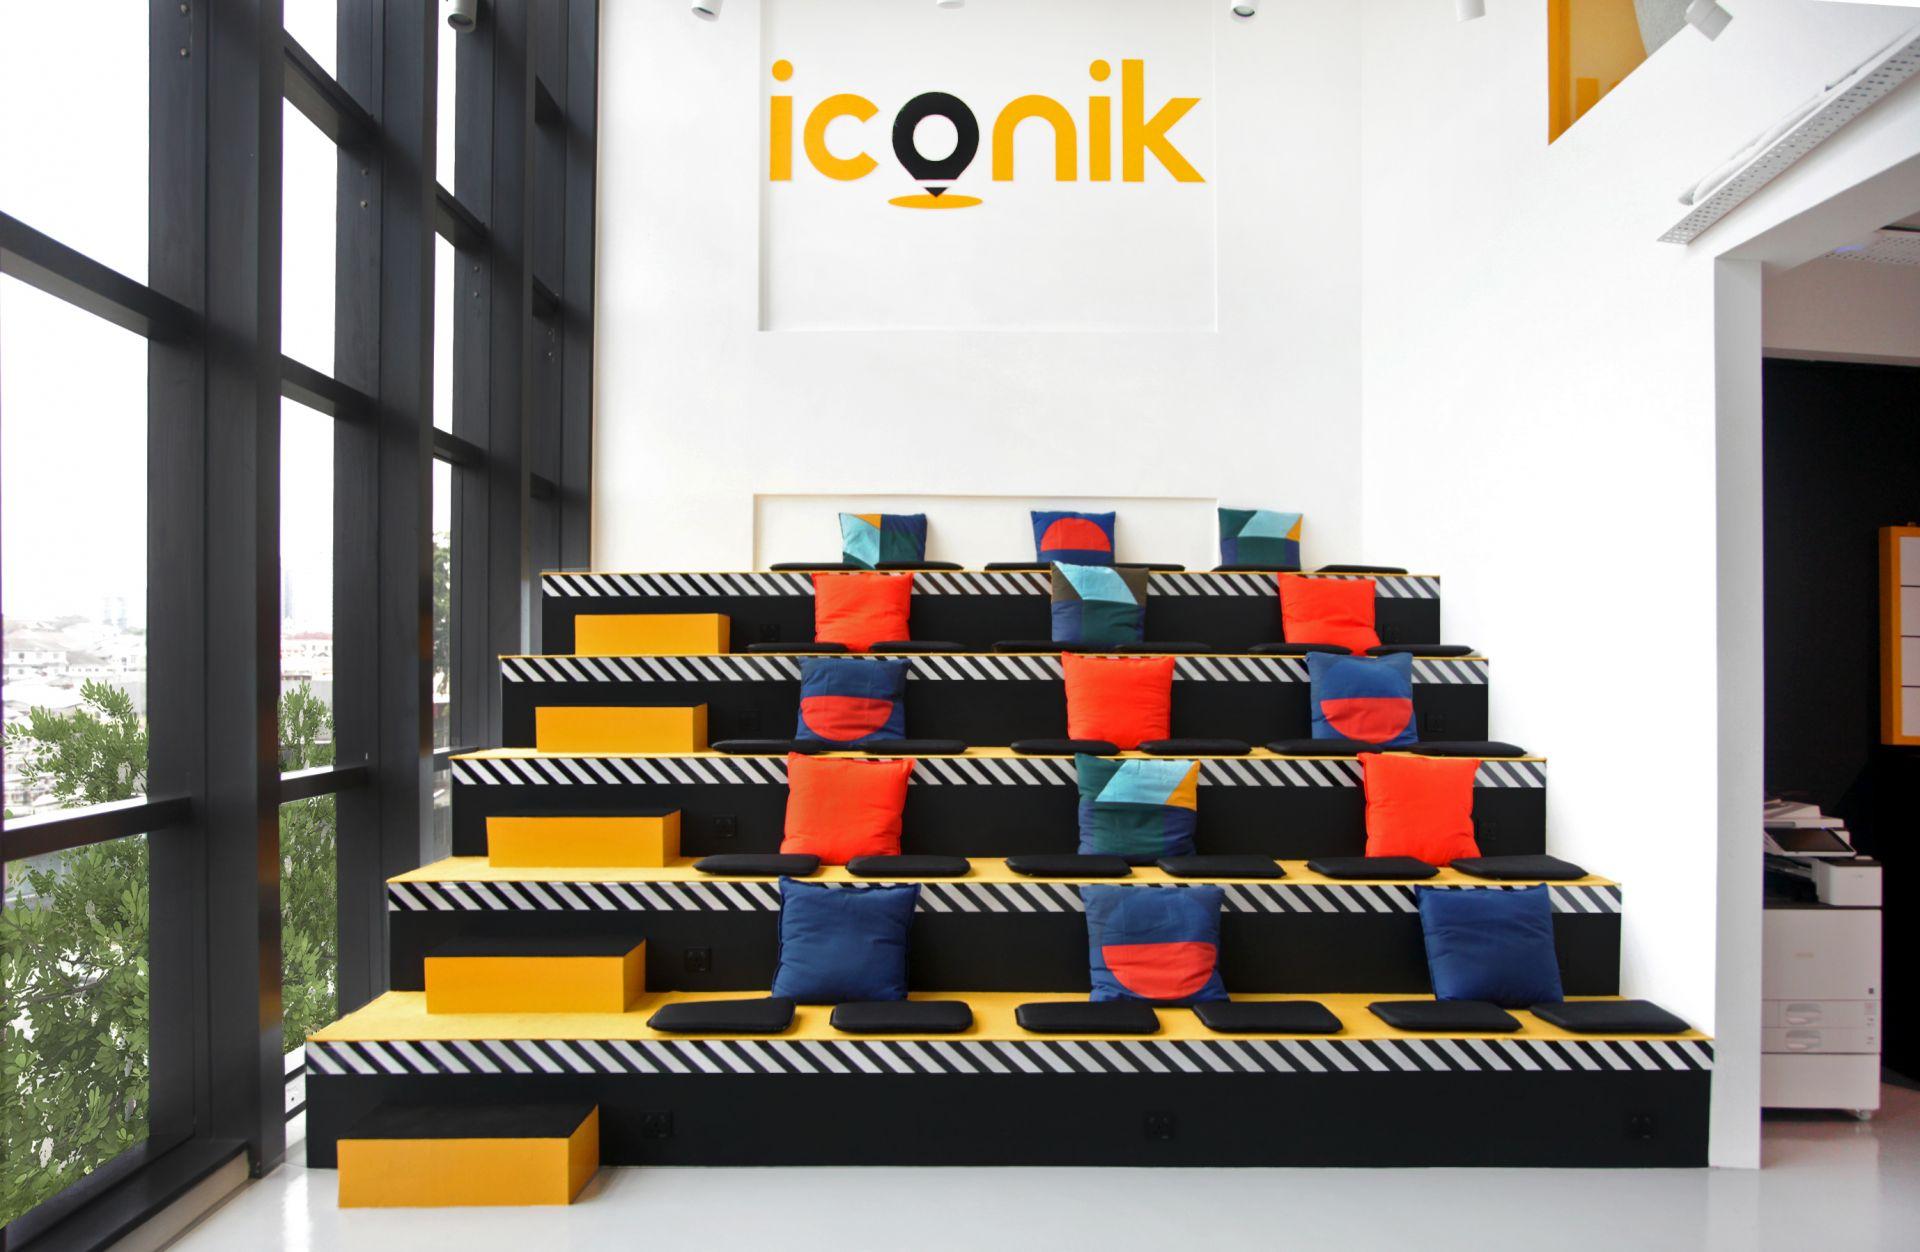 Iconik Malaysia Sdn Bhd, Petaling Jaya